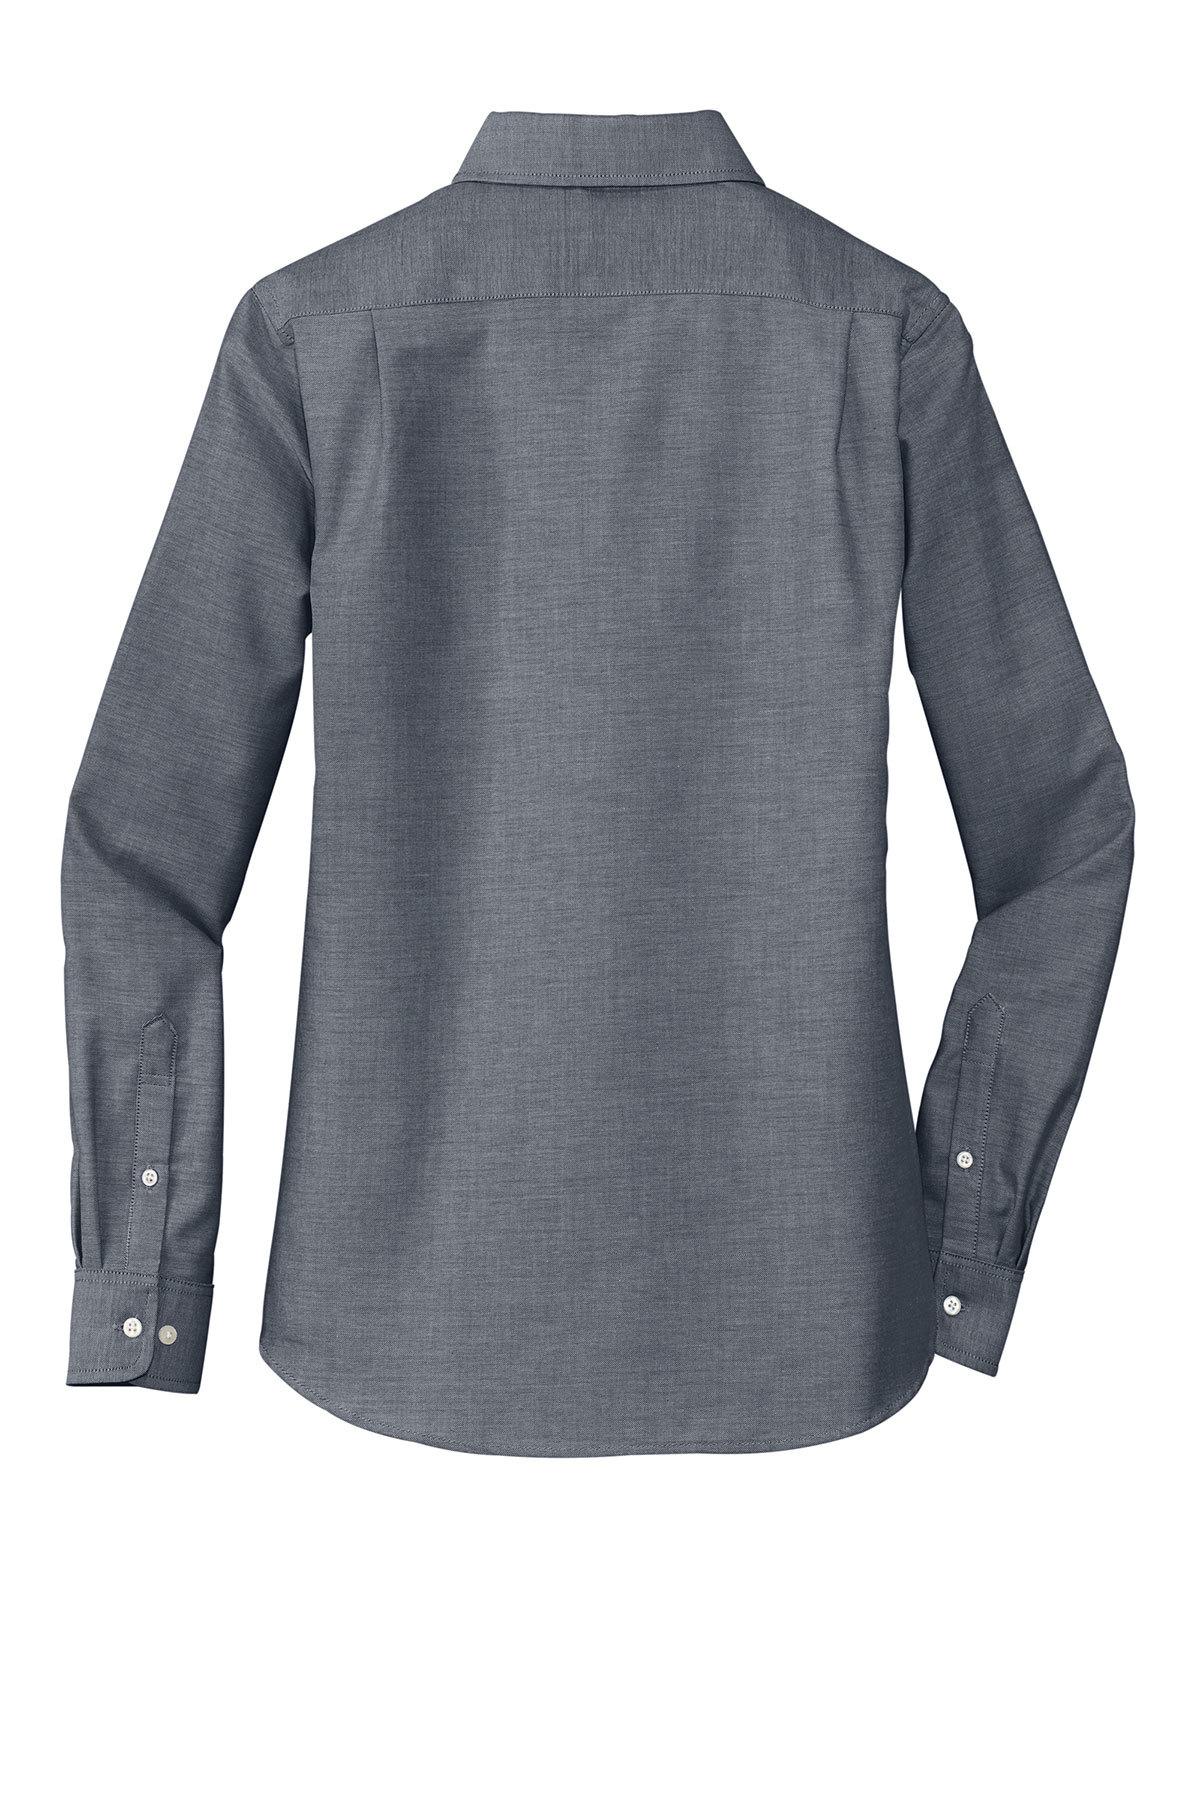 2077ad4588f Port Authority® Ladies SuperPro™ Oxford Shirt - Concept Design ...